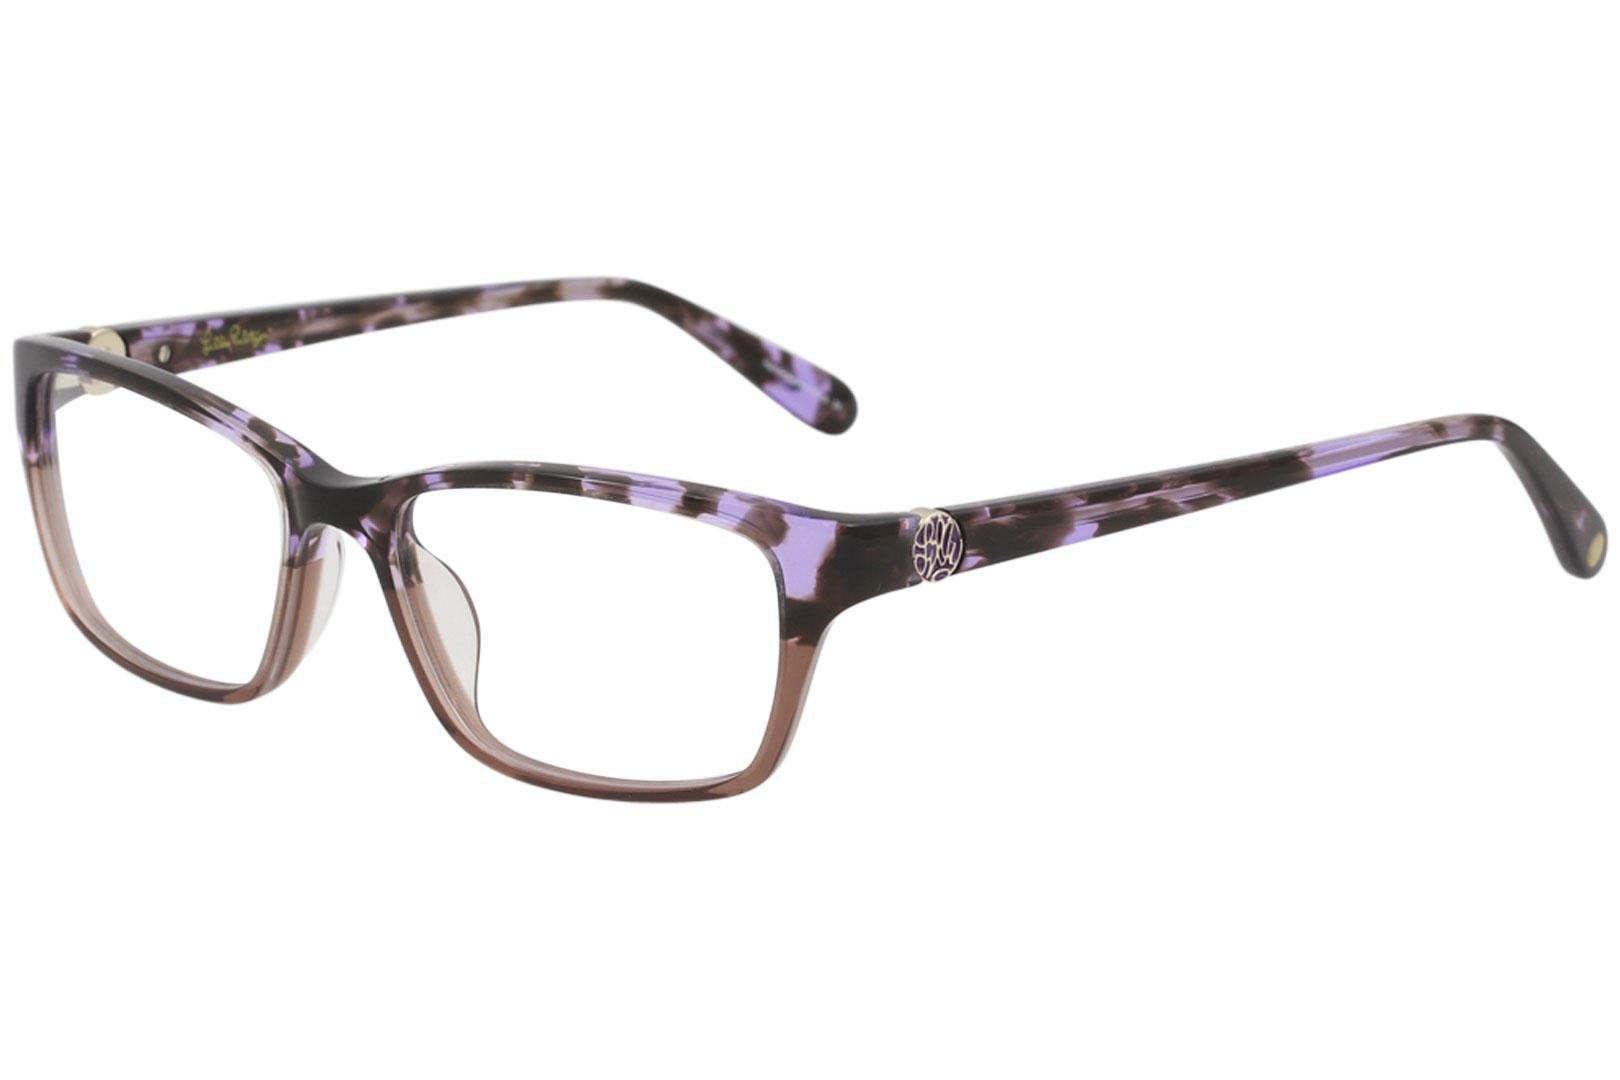 Image of Lilly Pulitzer Women's Eyeglasses Amberly Full Rim Optical Frame - Purple Tortoise   PU - Lens 51 Bridge 16 Temple 135mm